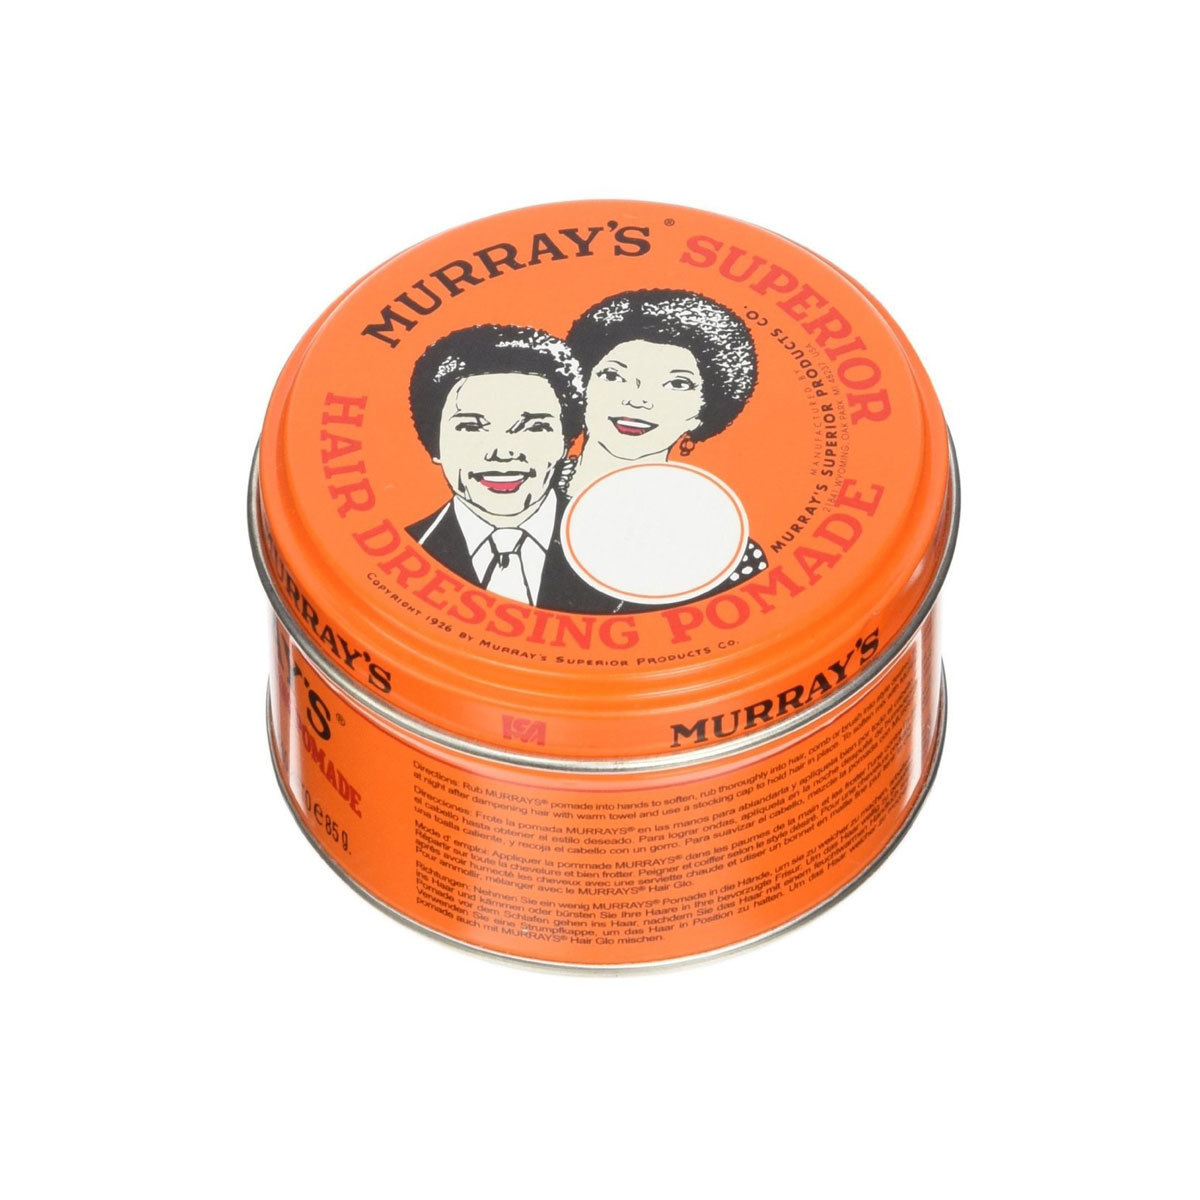 Pomada Murray's Hair Dressing (9,88 euros), disponible en Amazon